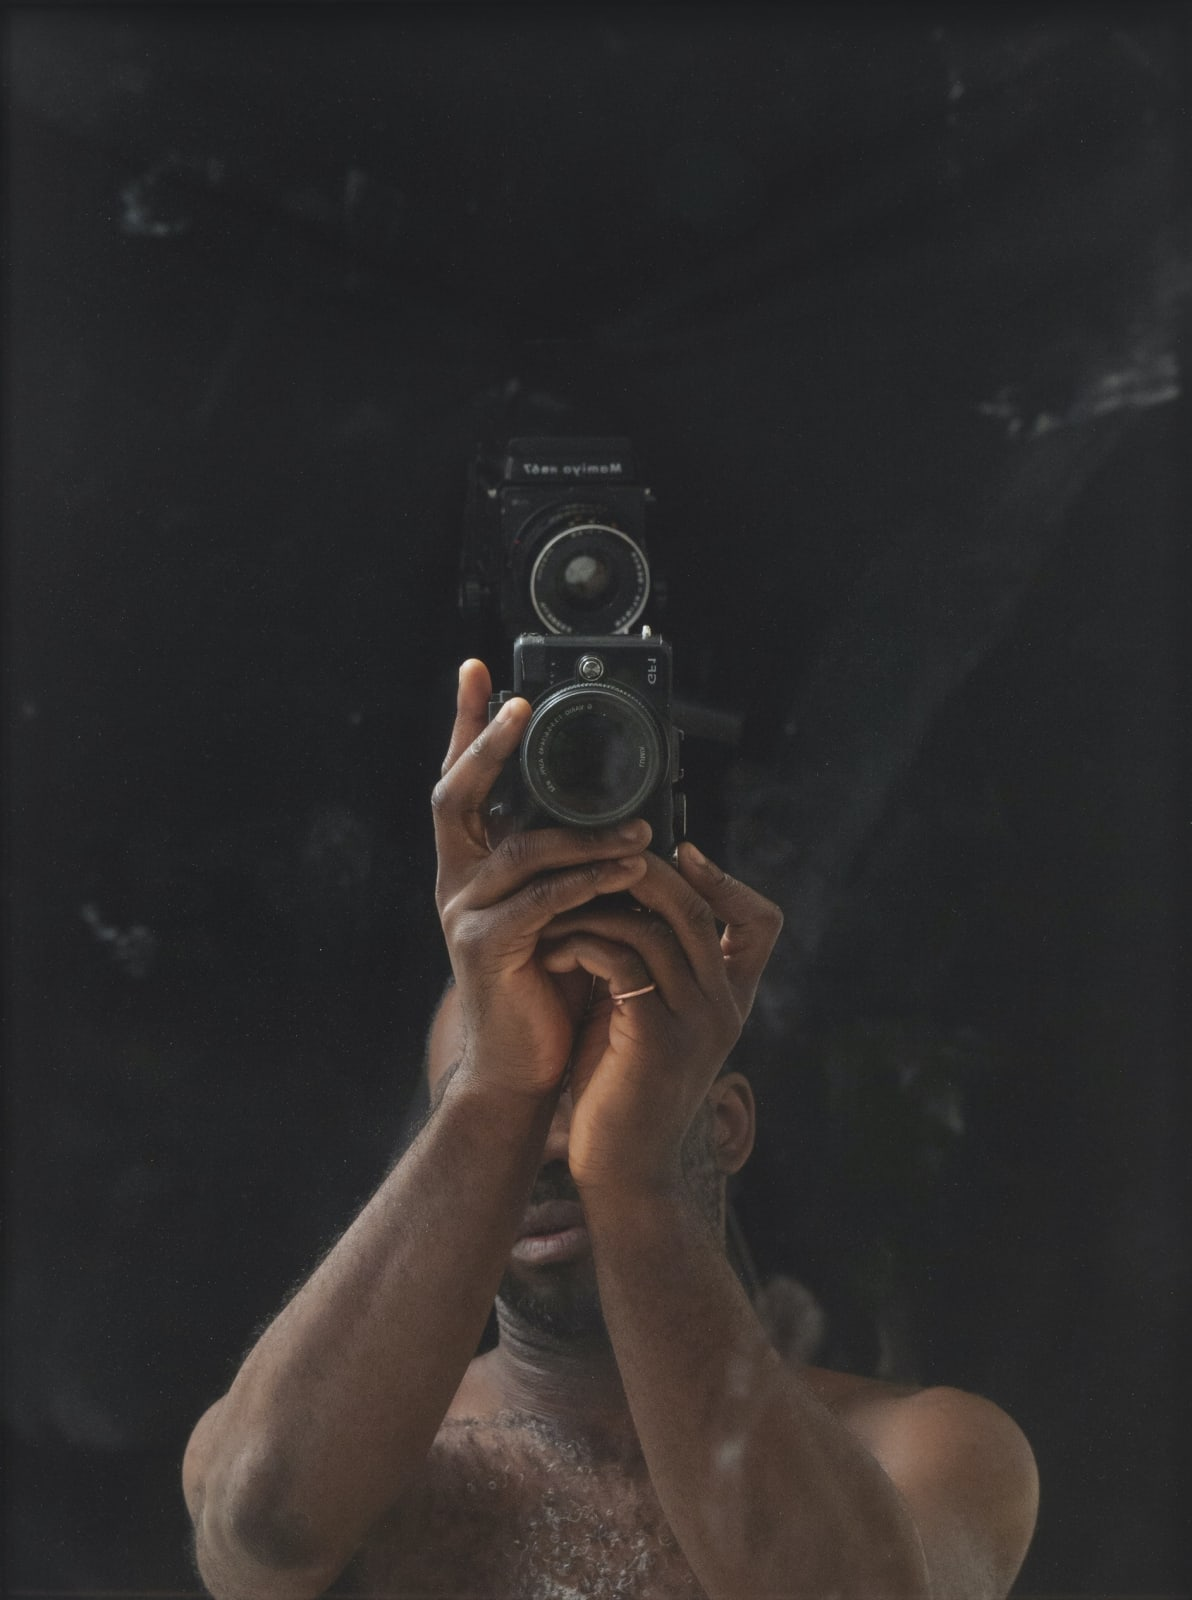 Paul Sepuya Drop Scene, 2018